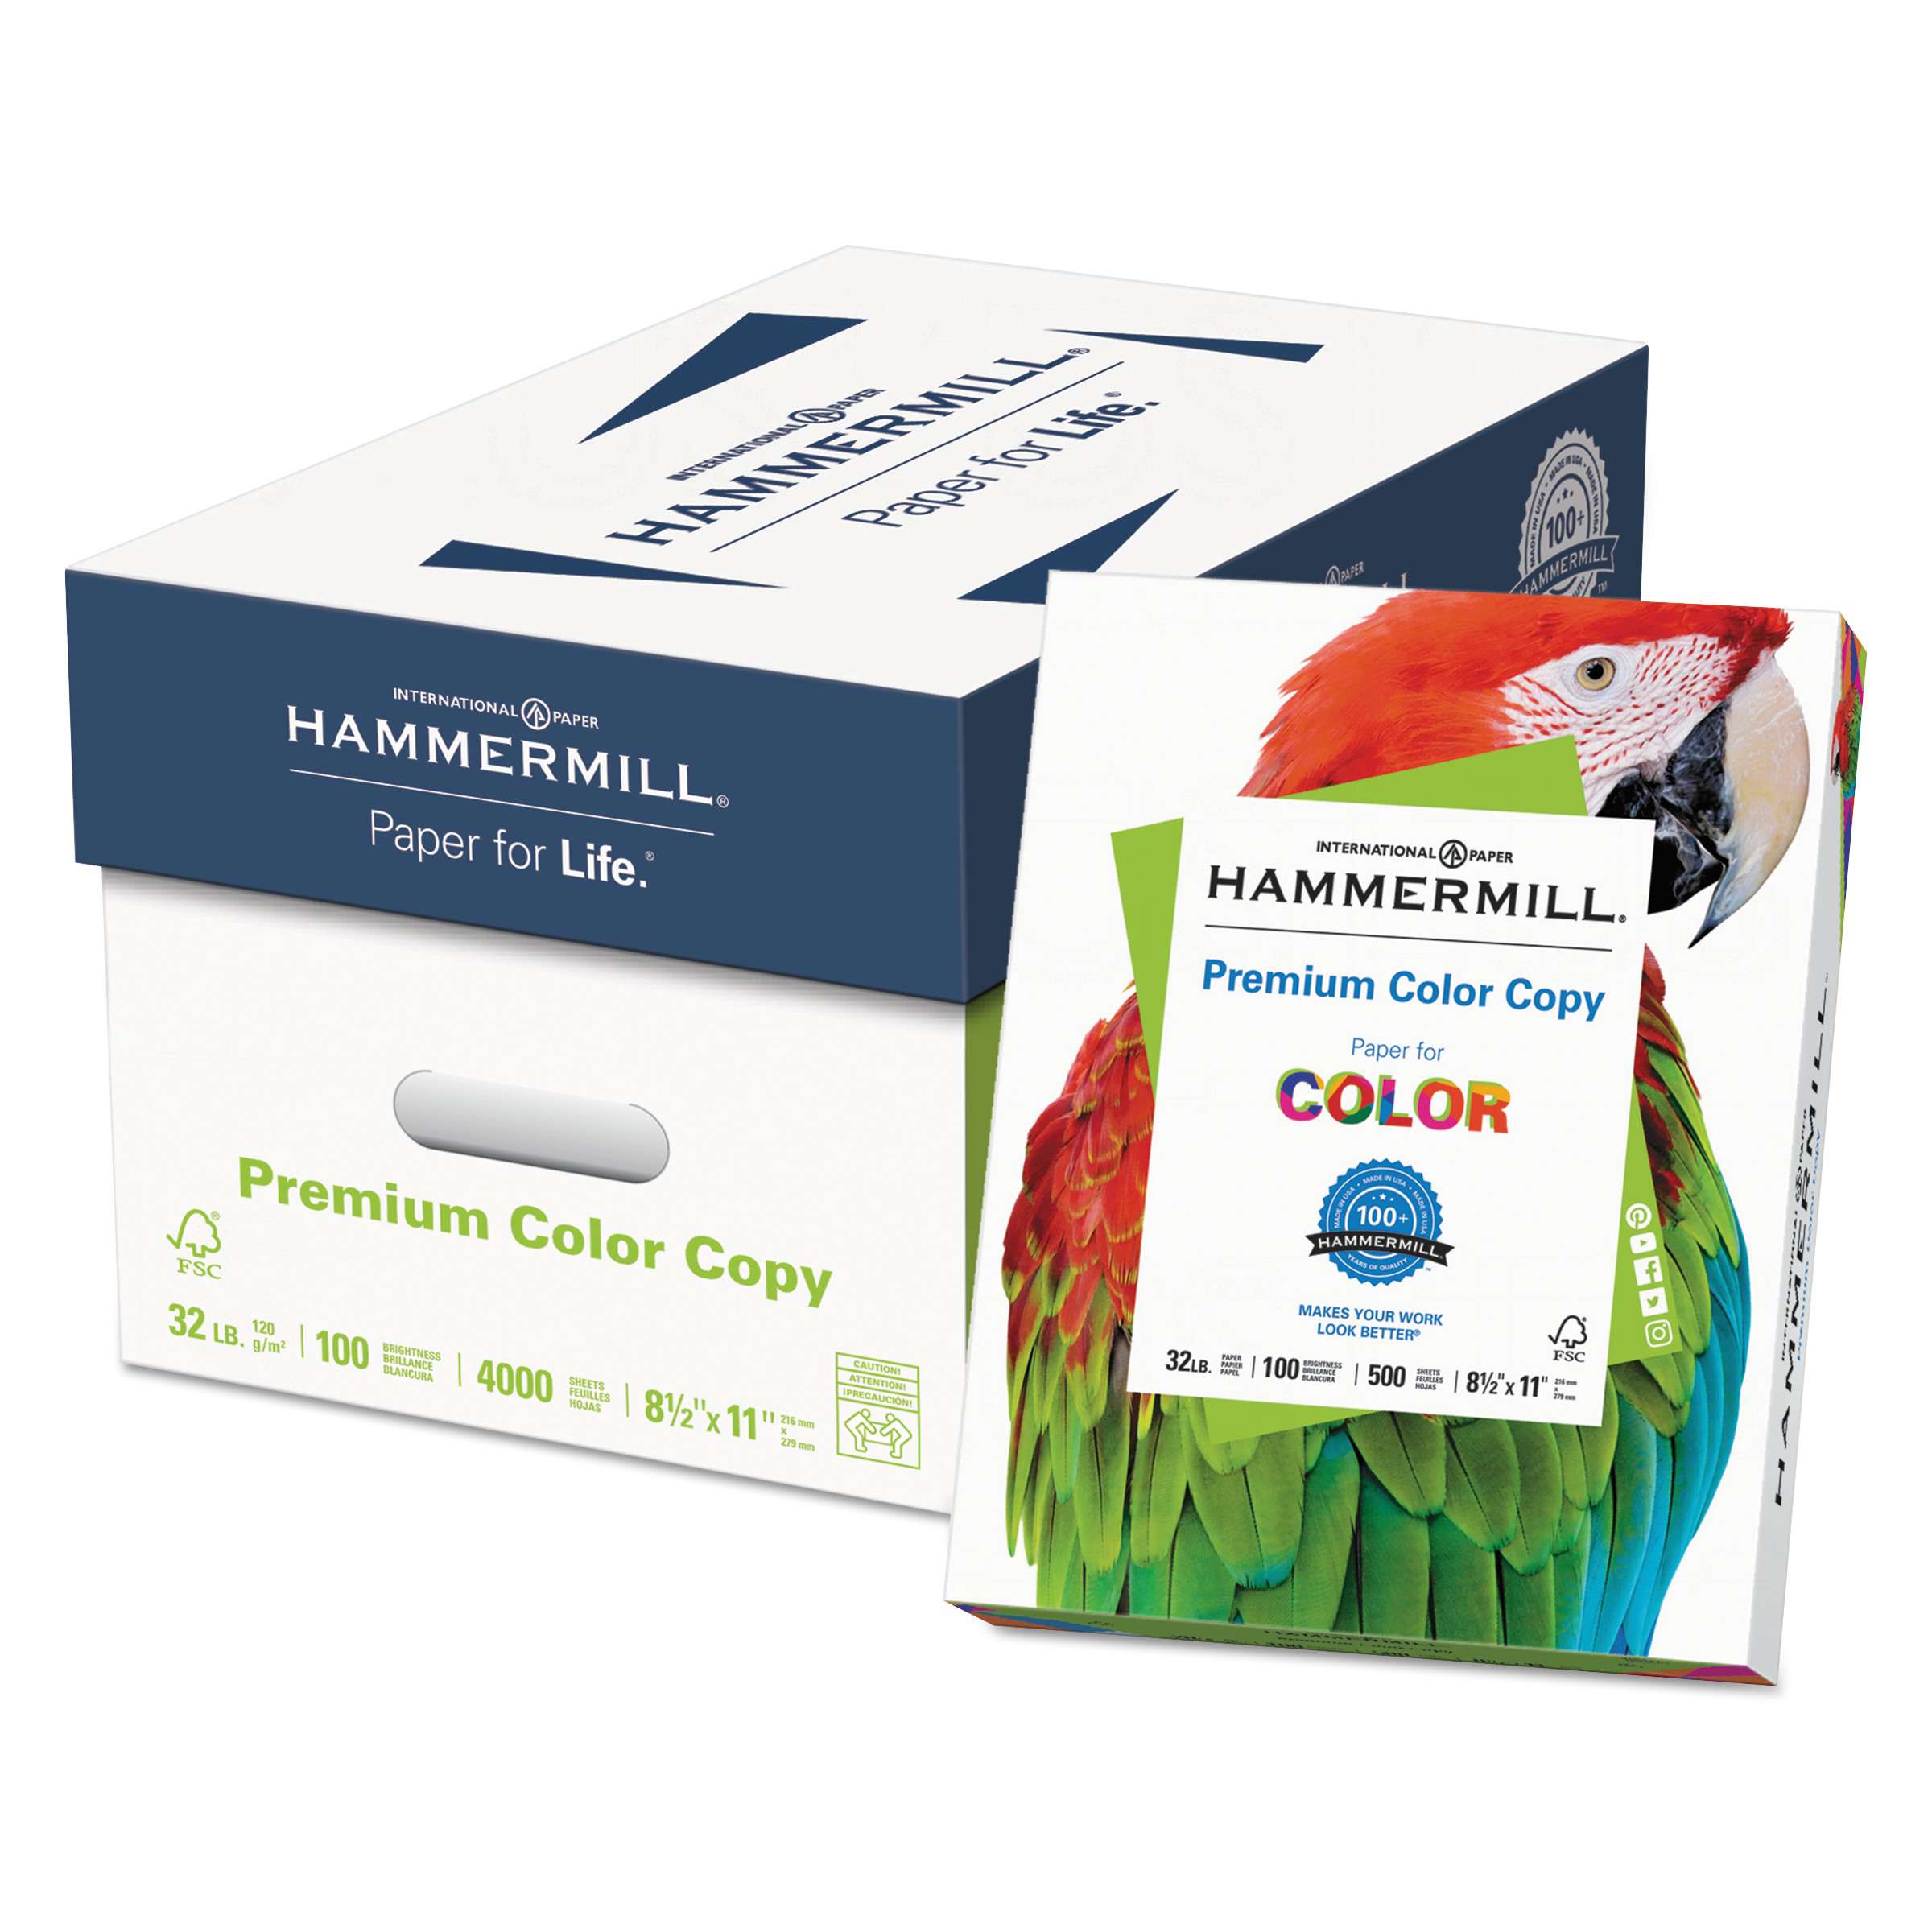 Hammermill Premium Color Copy Paper, 100 Bright, 32lb, Letter, Photo White, 500 Sheets/Ream -HAM102630